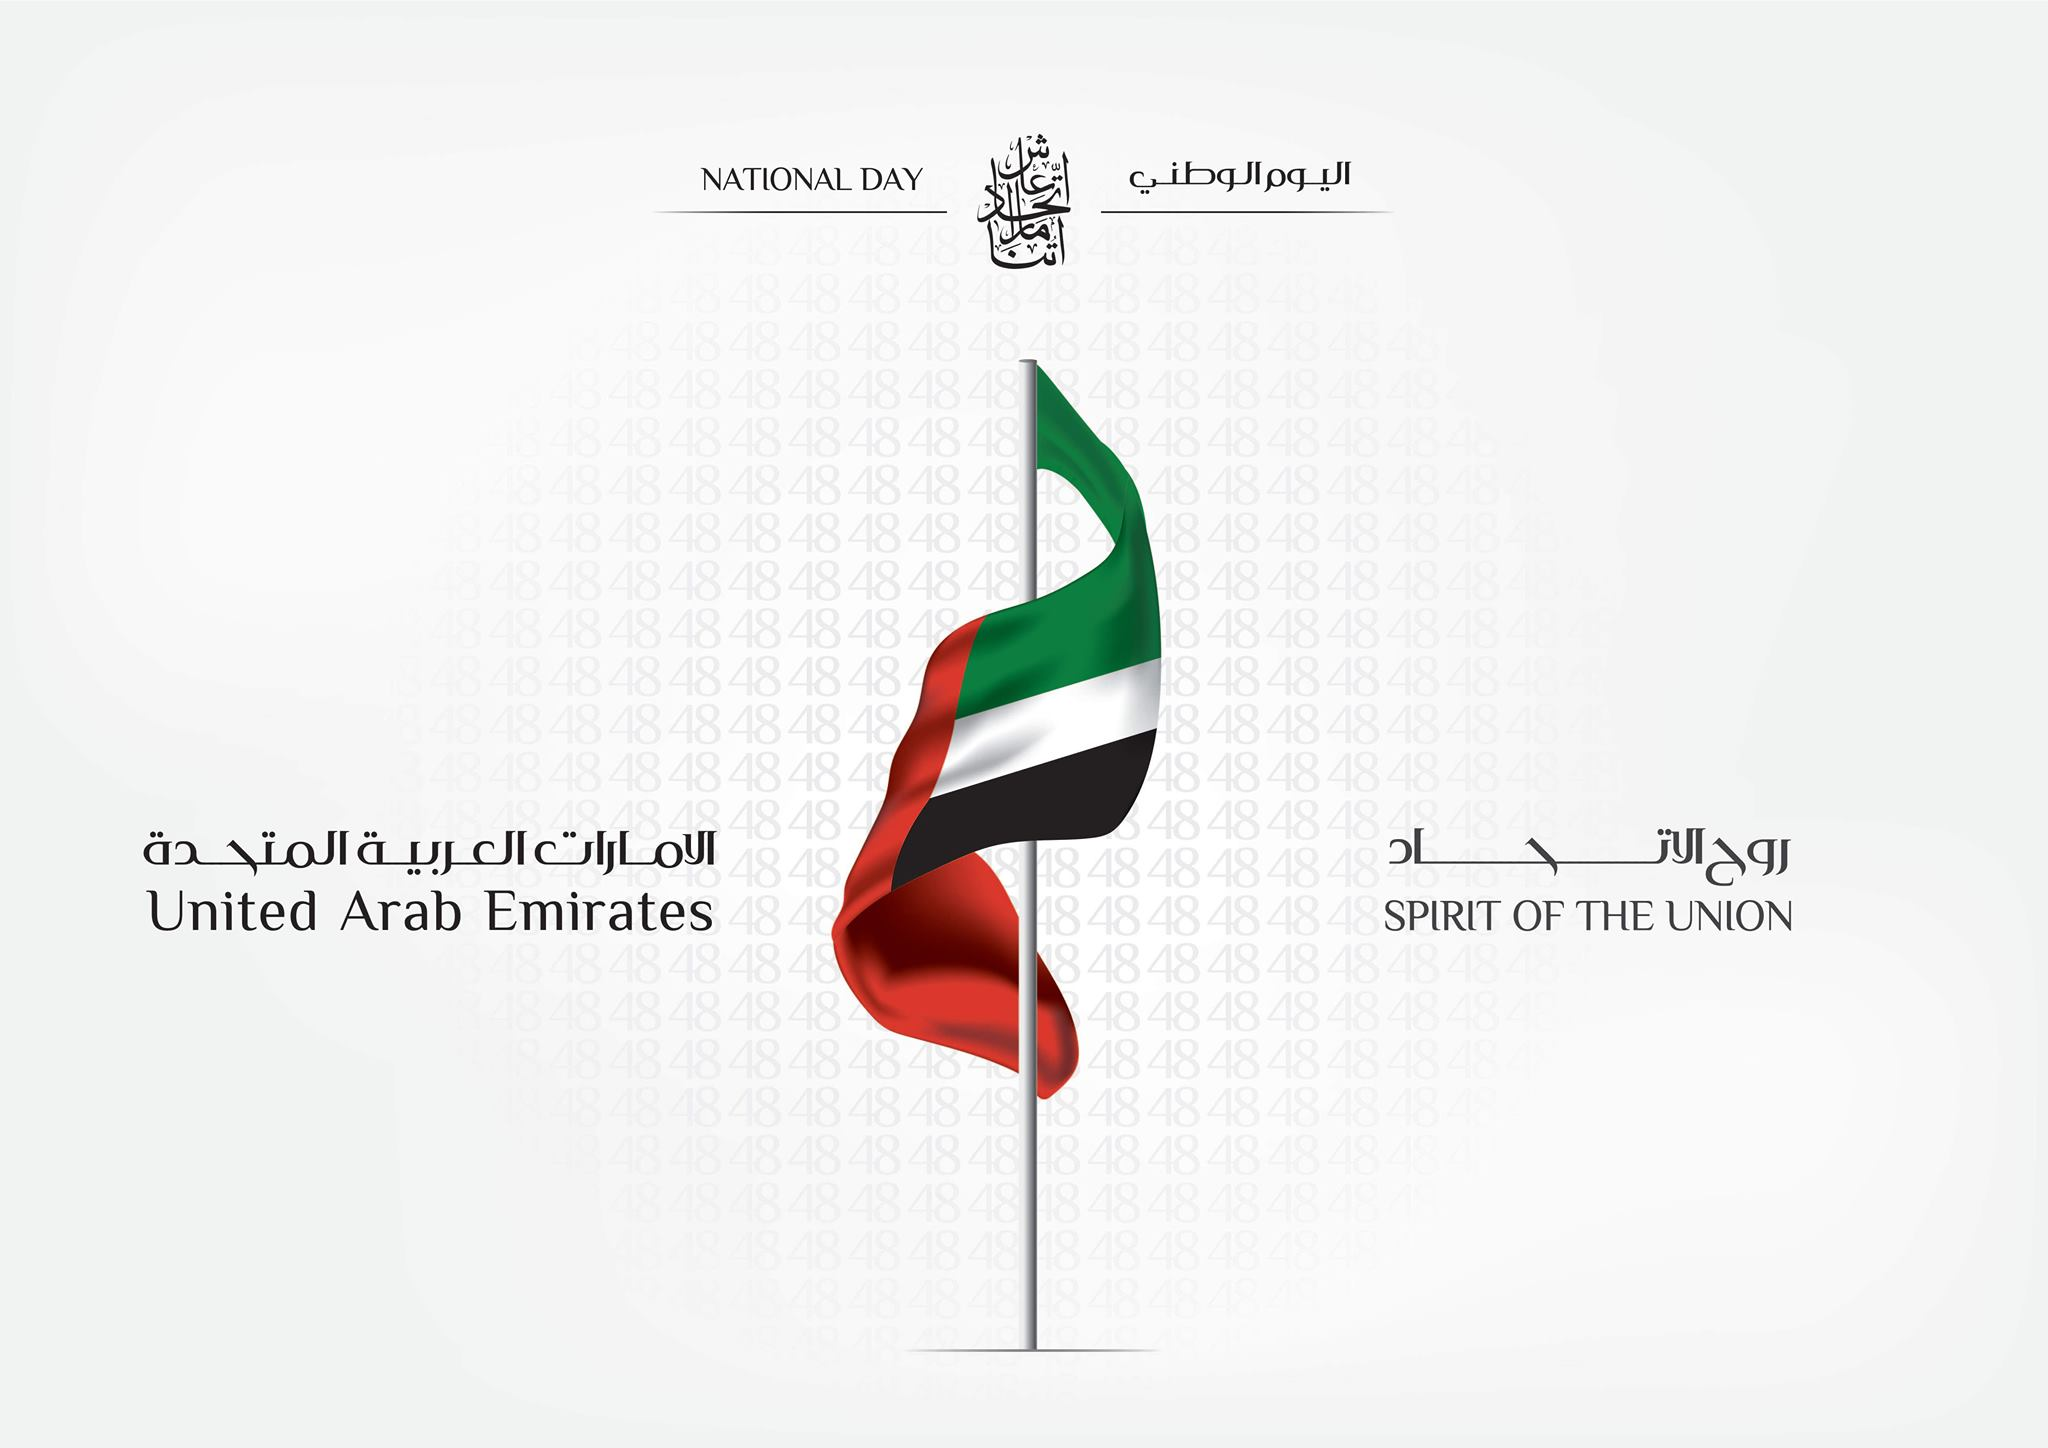 Emirates International Group, Emirates Décor, National Day in UNITED ARAB EMIRATES